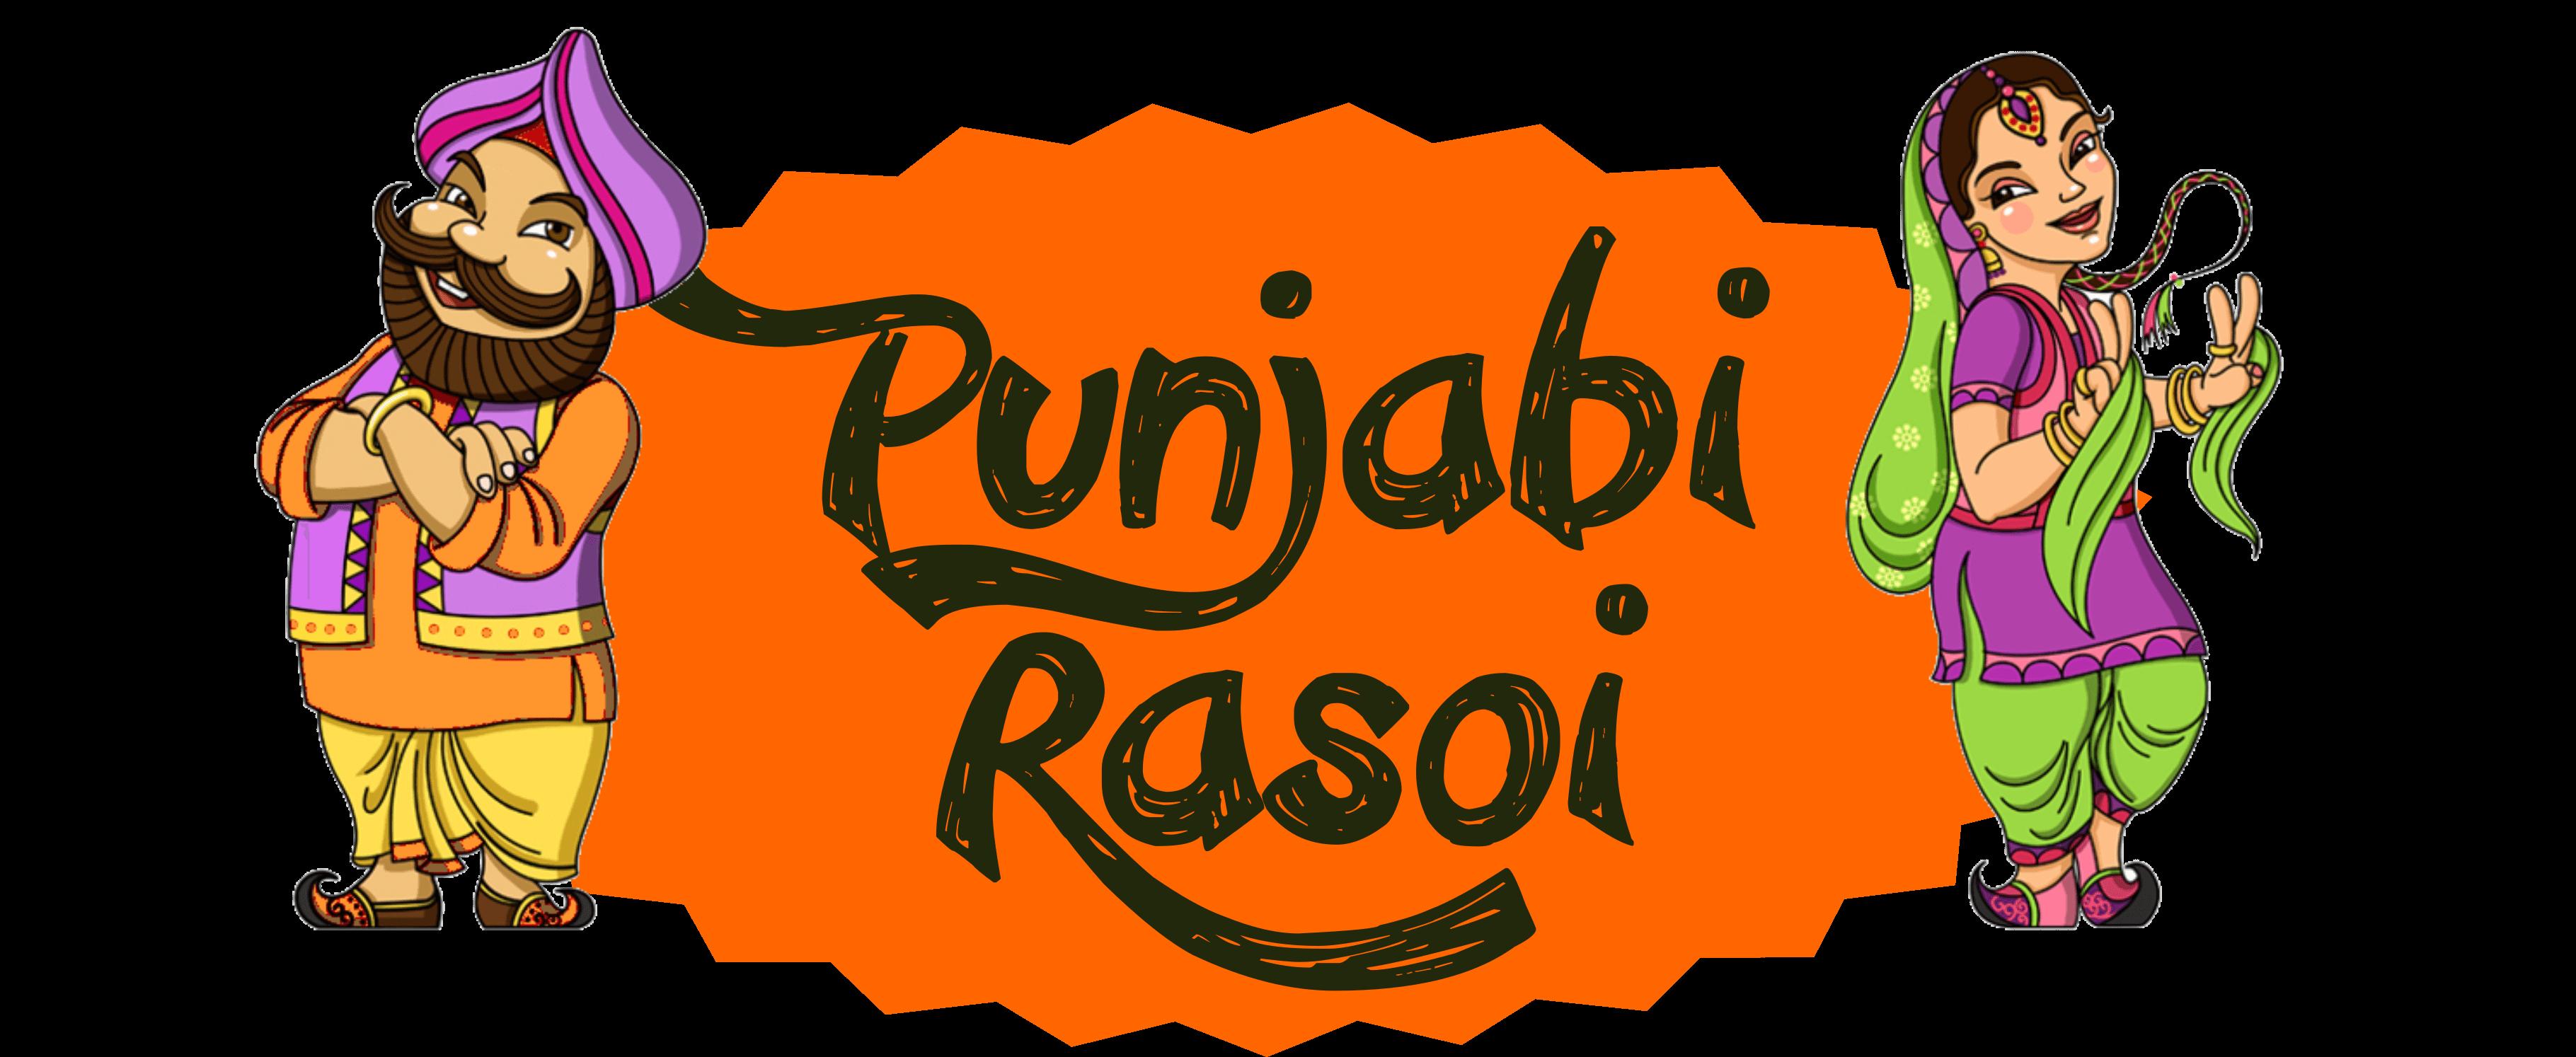 Culture clipart punjabi, Culture punjabi Transparent FREE.